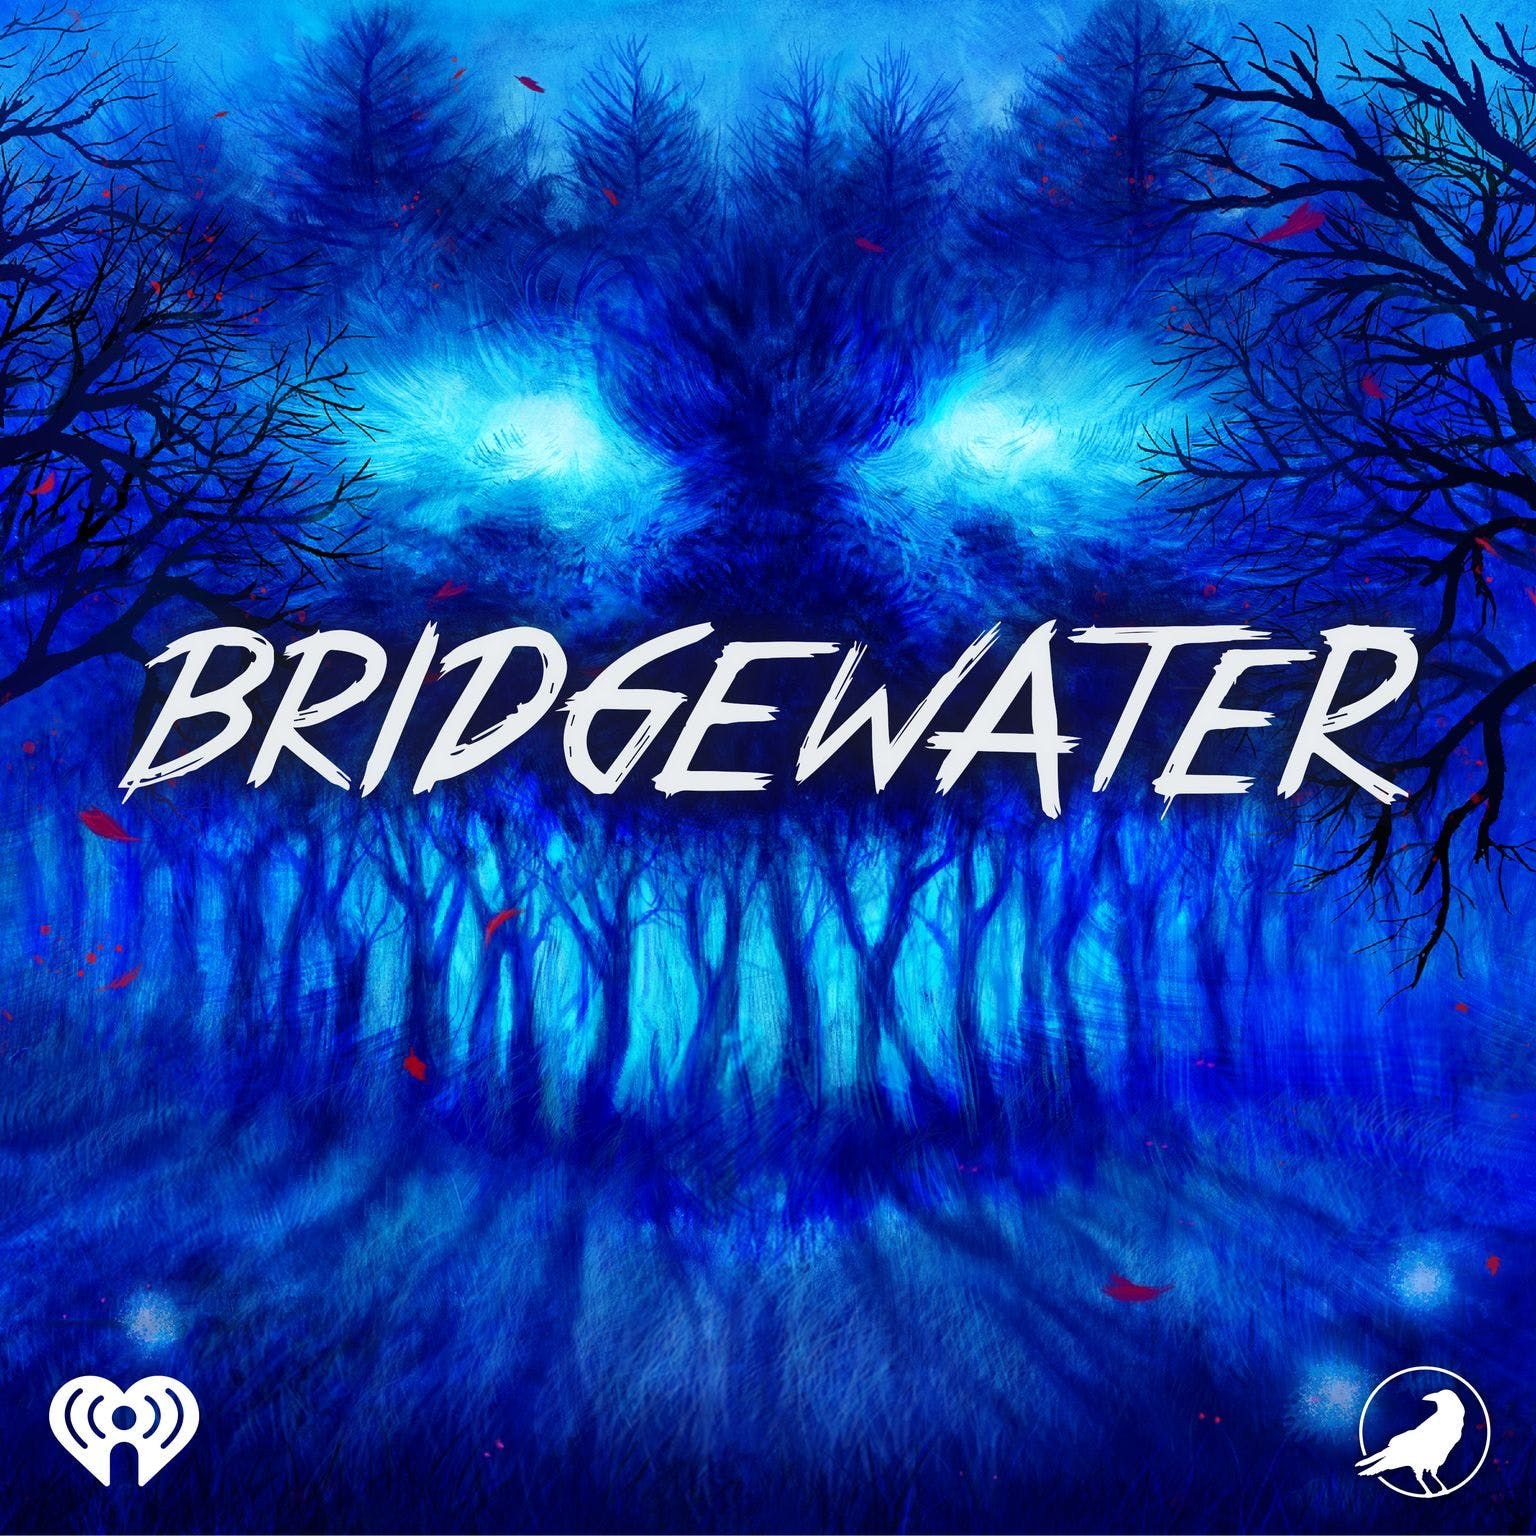 Bridgewater by iHeartRadio and Grim & Mild